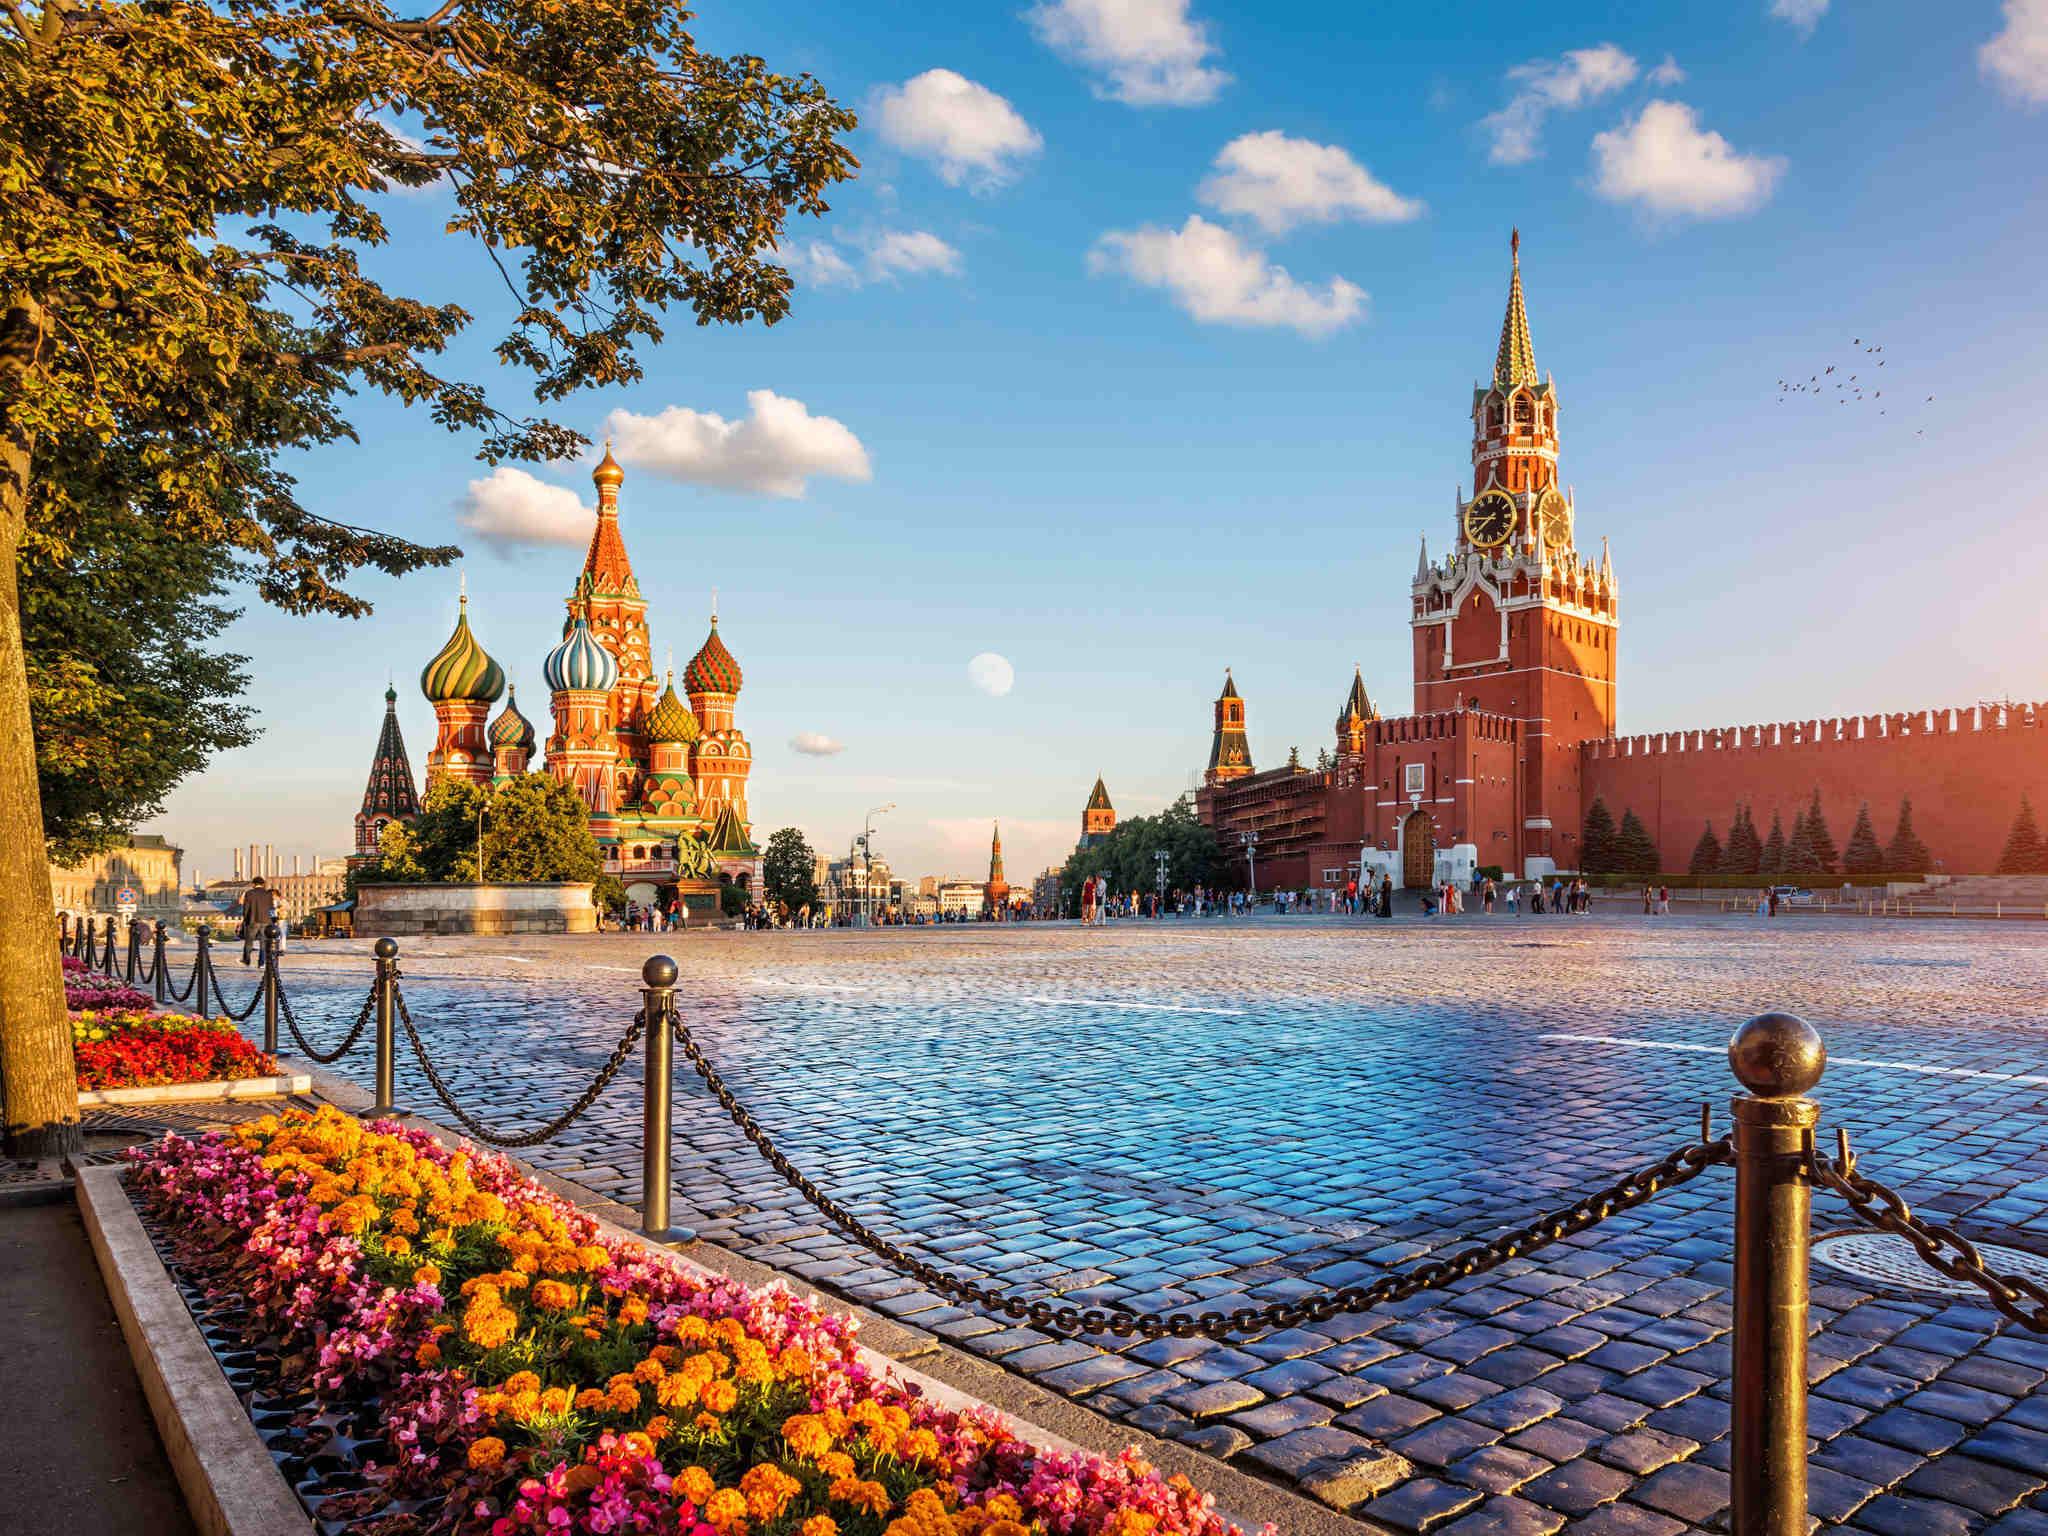 Russian Towns, Cities / Urban Development - Page 2 El2GiZ1XgAECVFF?format=jpg&name=large